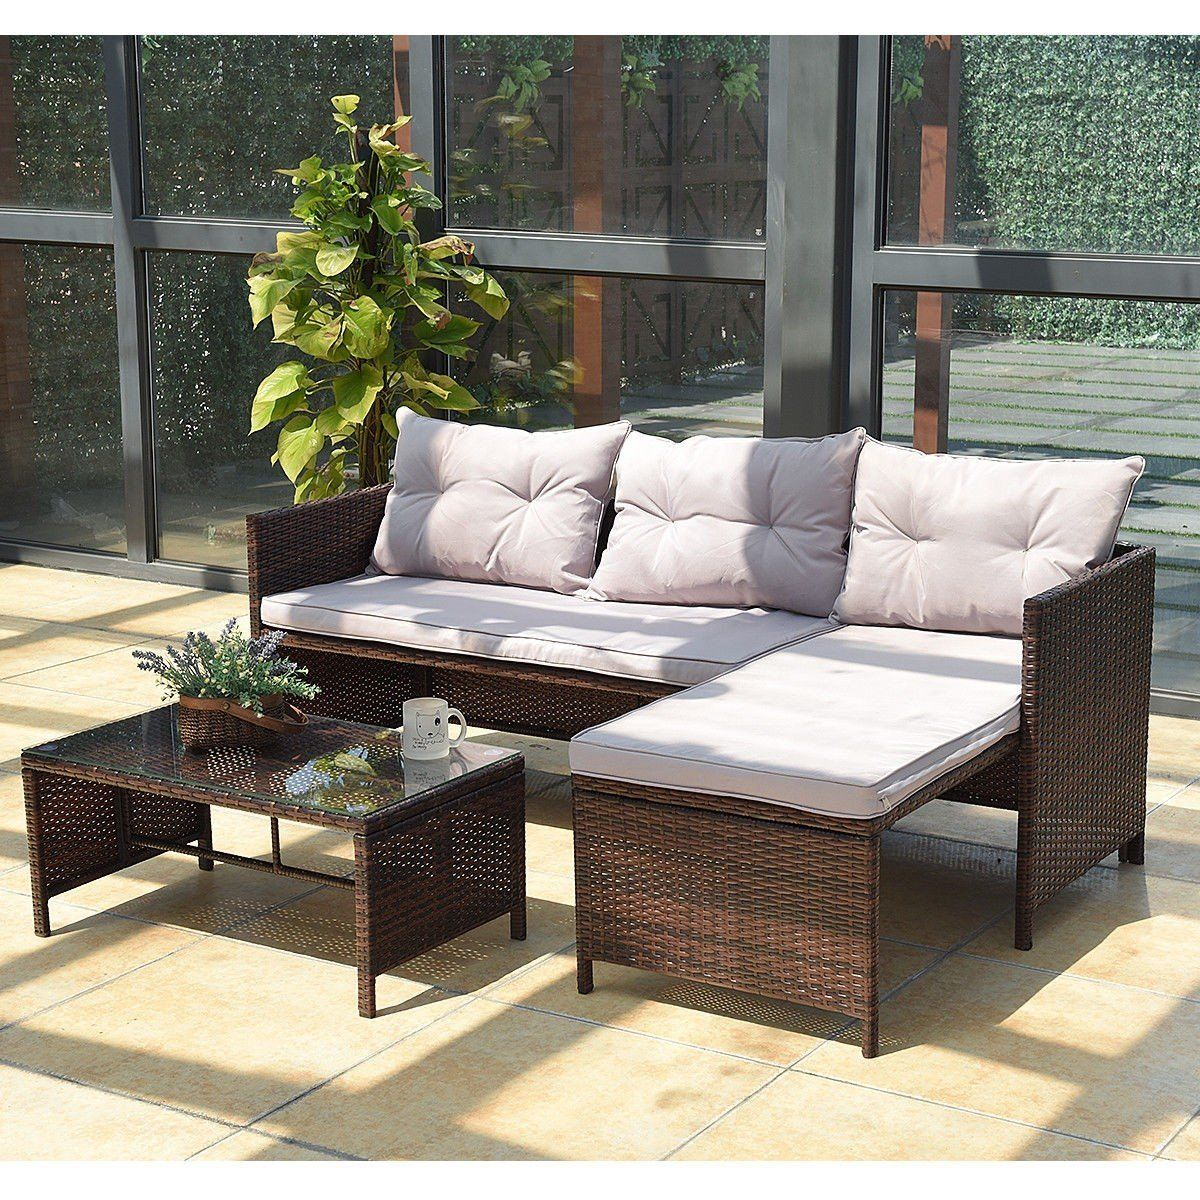 12 PCS Rattan Wicker Outdoor Patio Sofa Set  Patio sofa set